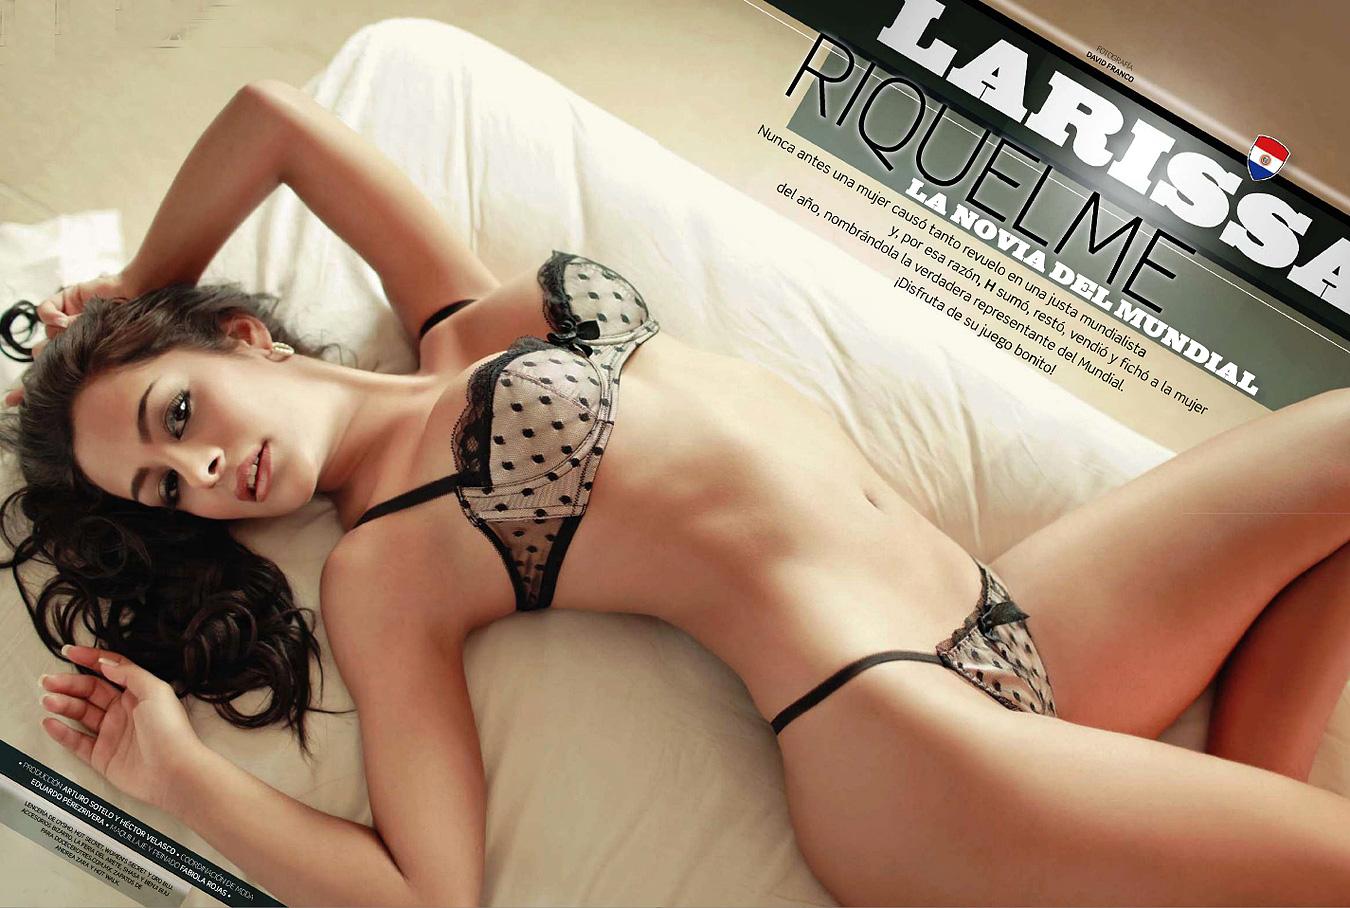 http://1.bp.blogspot.com/_6-mVibN-7Tk/TFNlyRFqlSI/AAAAAAAAARA/xNgUmNqpONI/s1600/Larissa+Riquelme+8.jpg